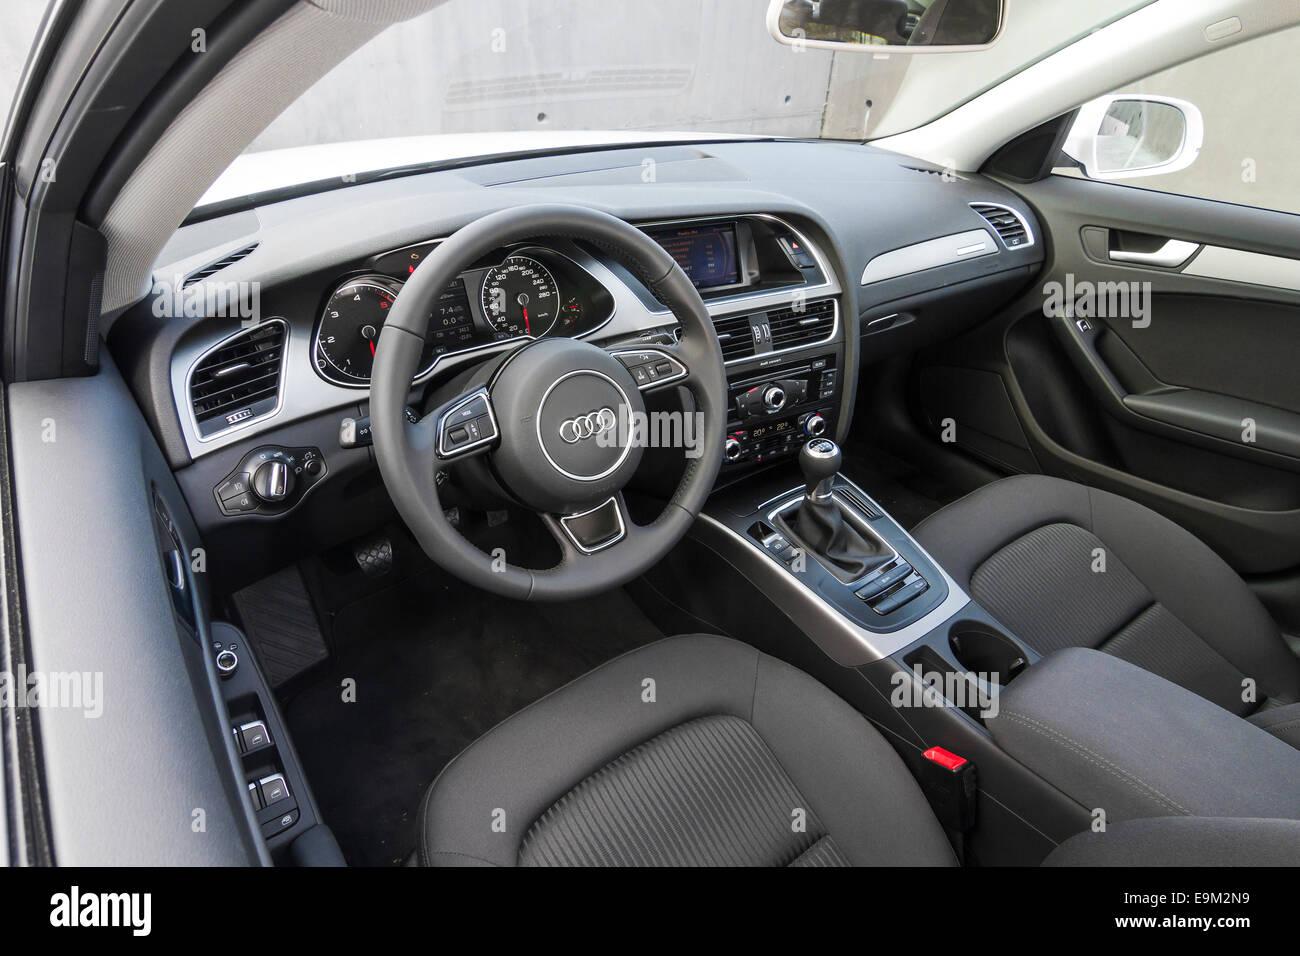 Audi A4 Limousine 2.0 TDI quattro edition - Stock Image